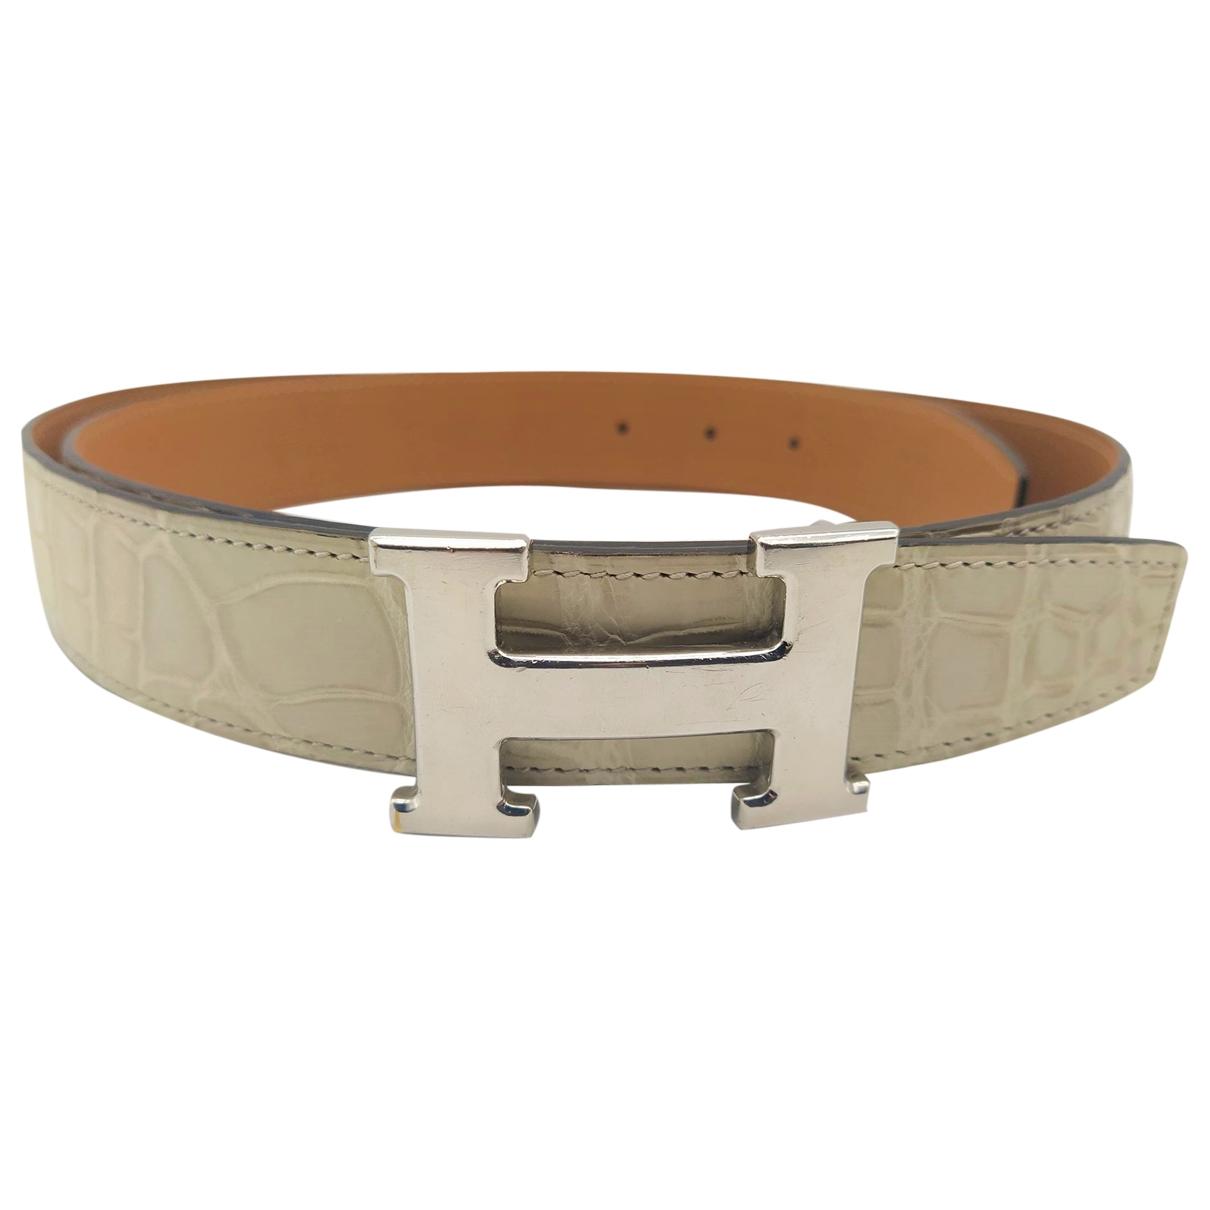 Cinturon H de Aligator Hermes